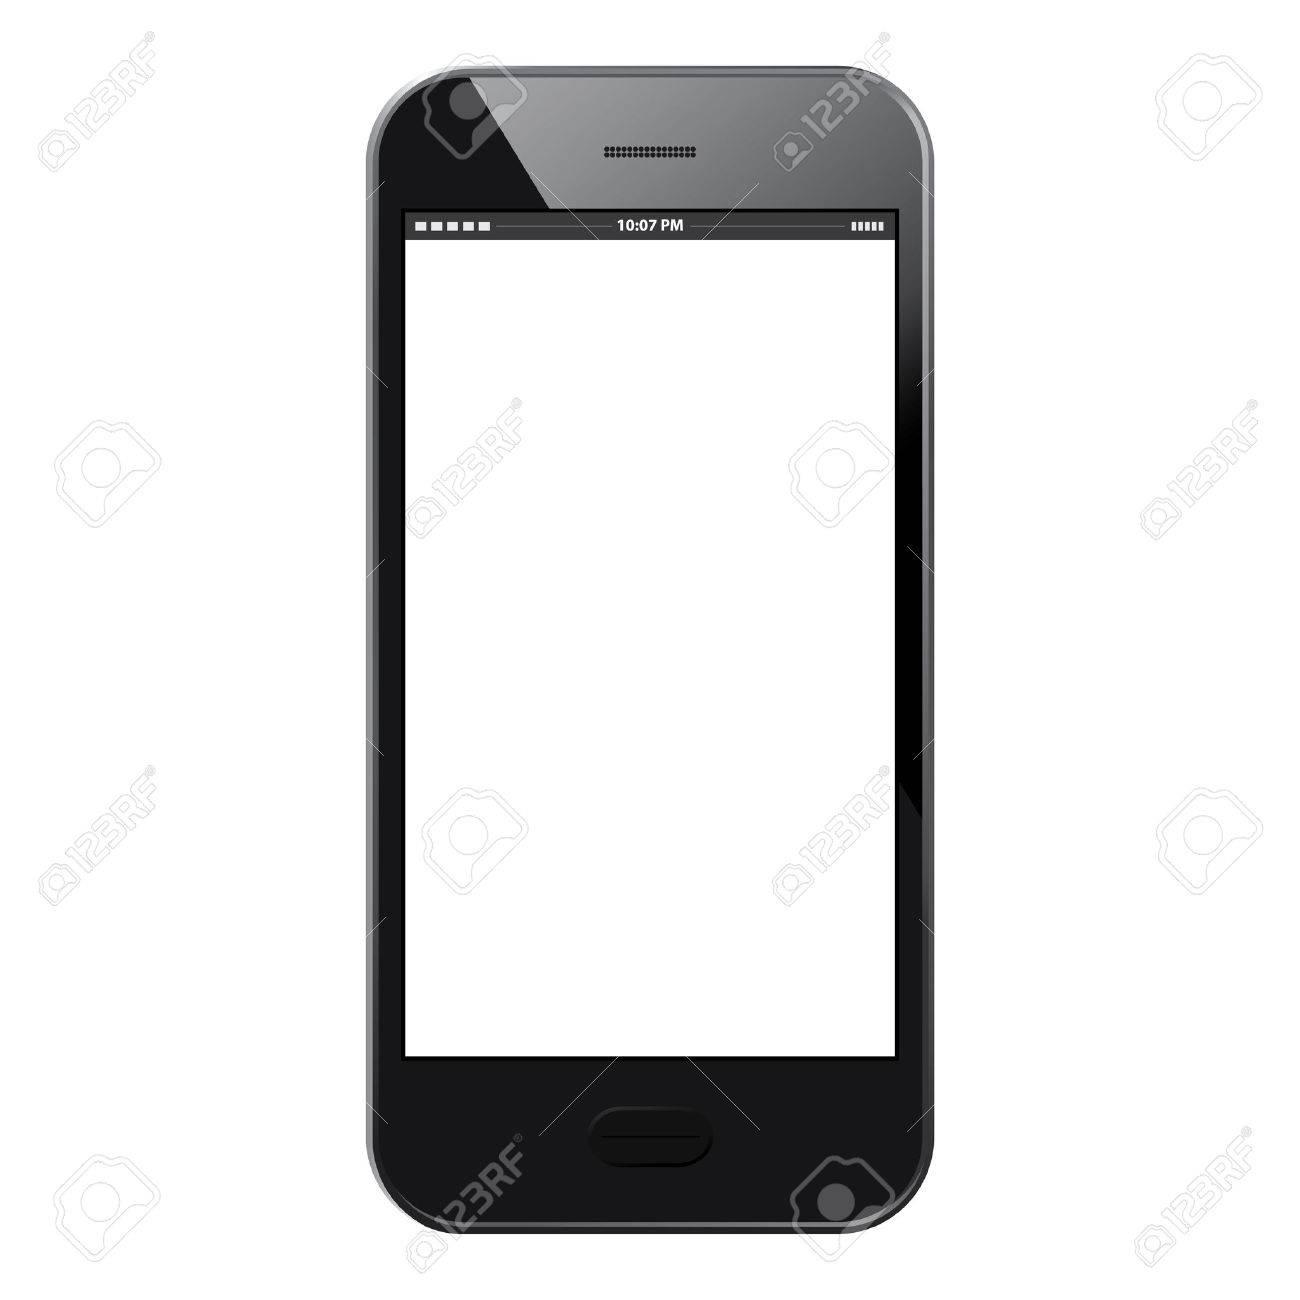 Mobile Phone - 36990829